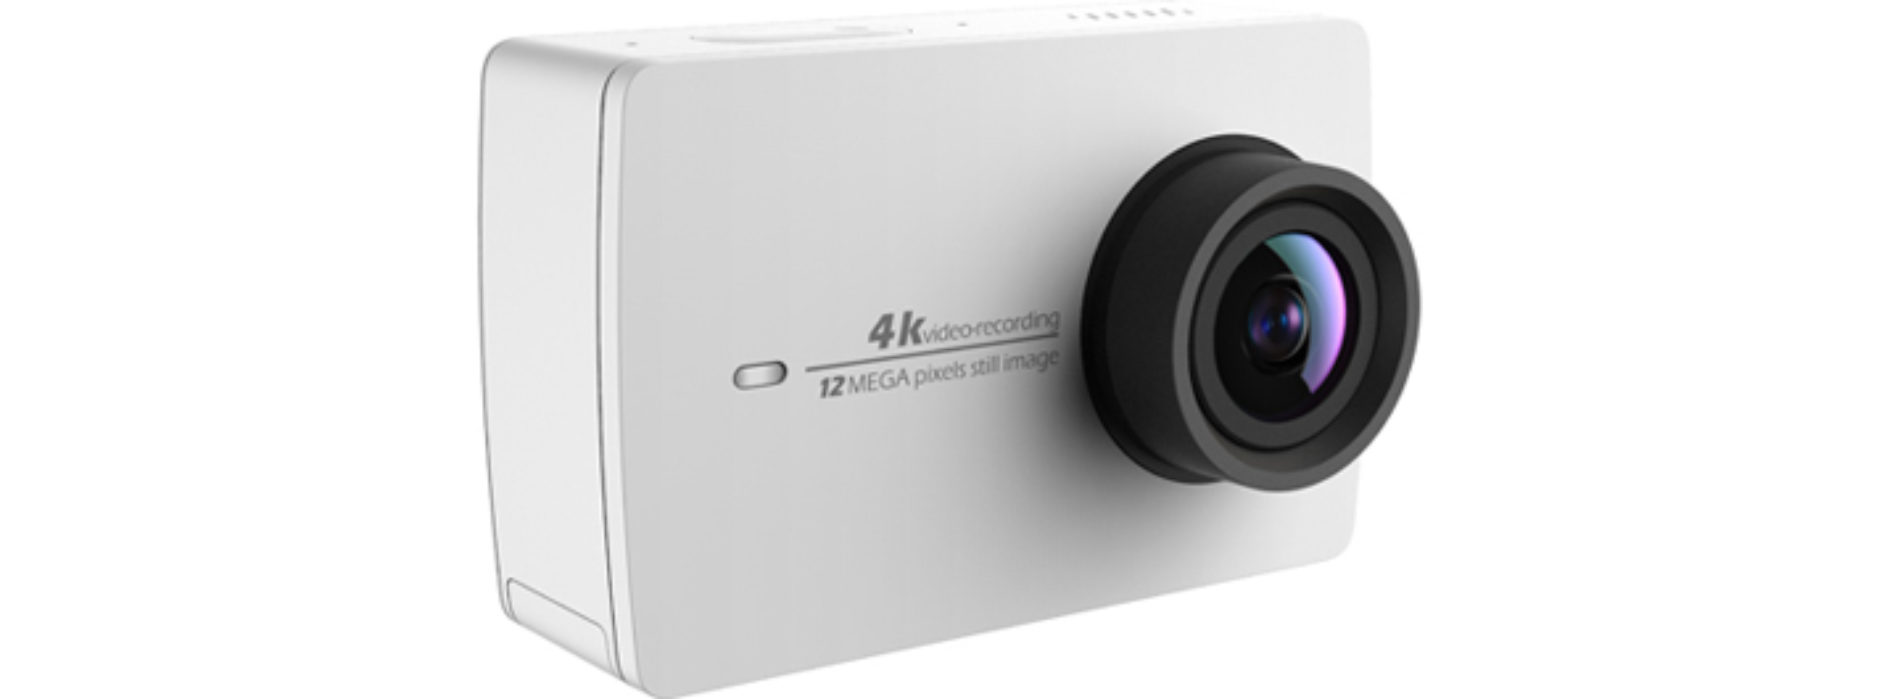 Ремонт экшн камер Xiaomi 4K